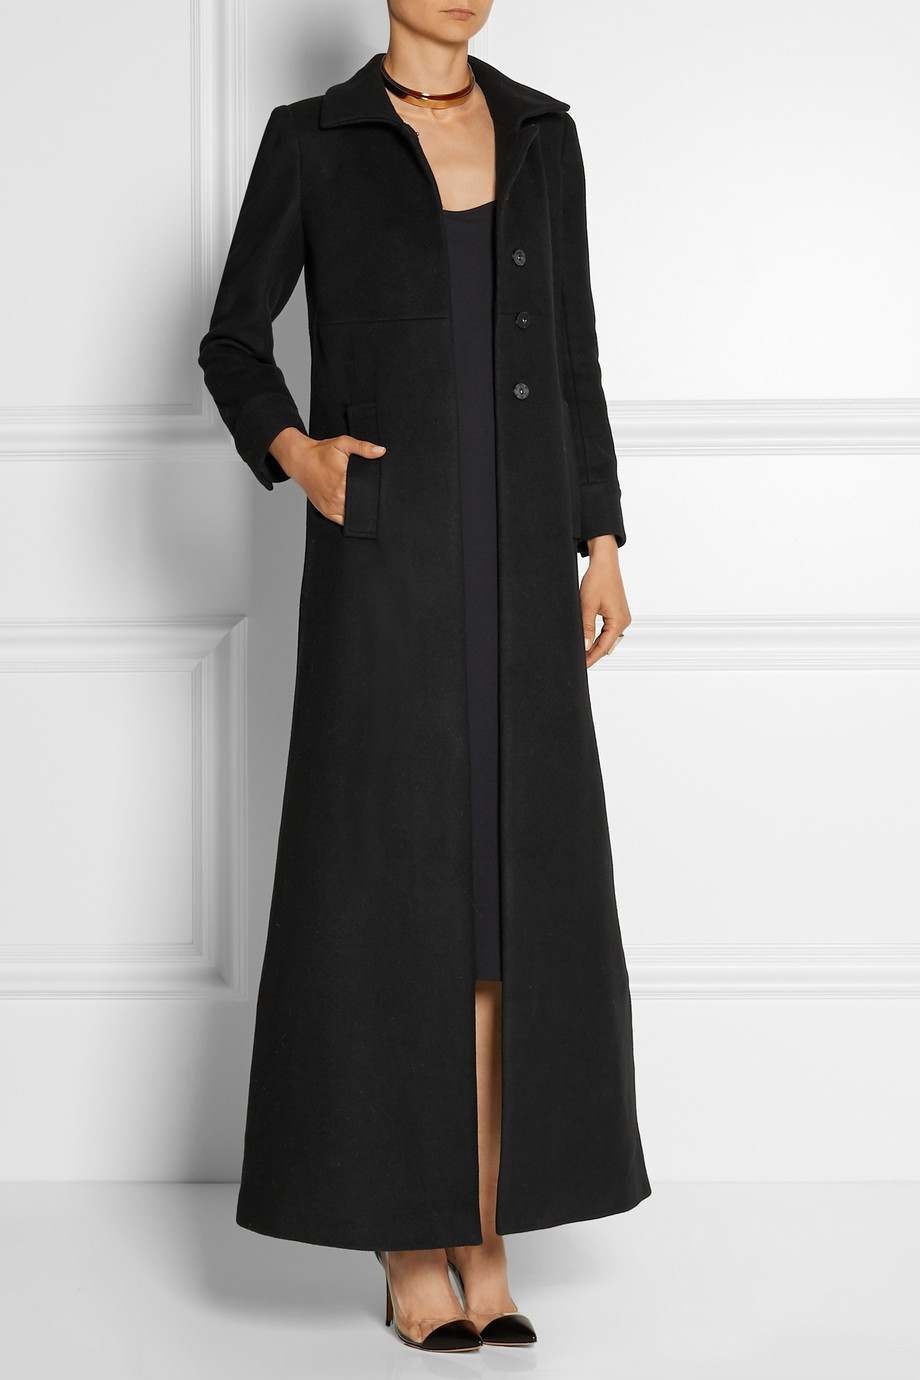 buy manteau femme 2016 uk women plus size. Black Bedroom Furniture Sets. Home Design Ideas